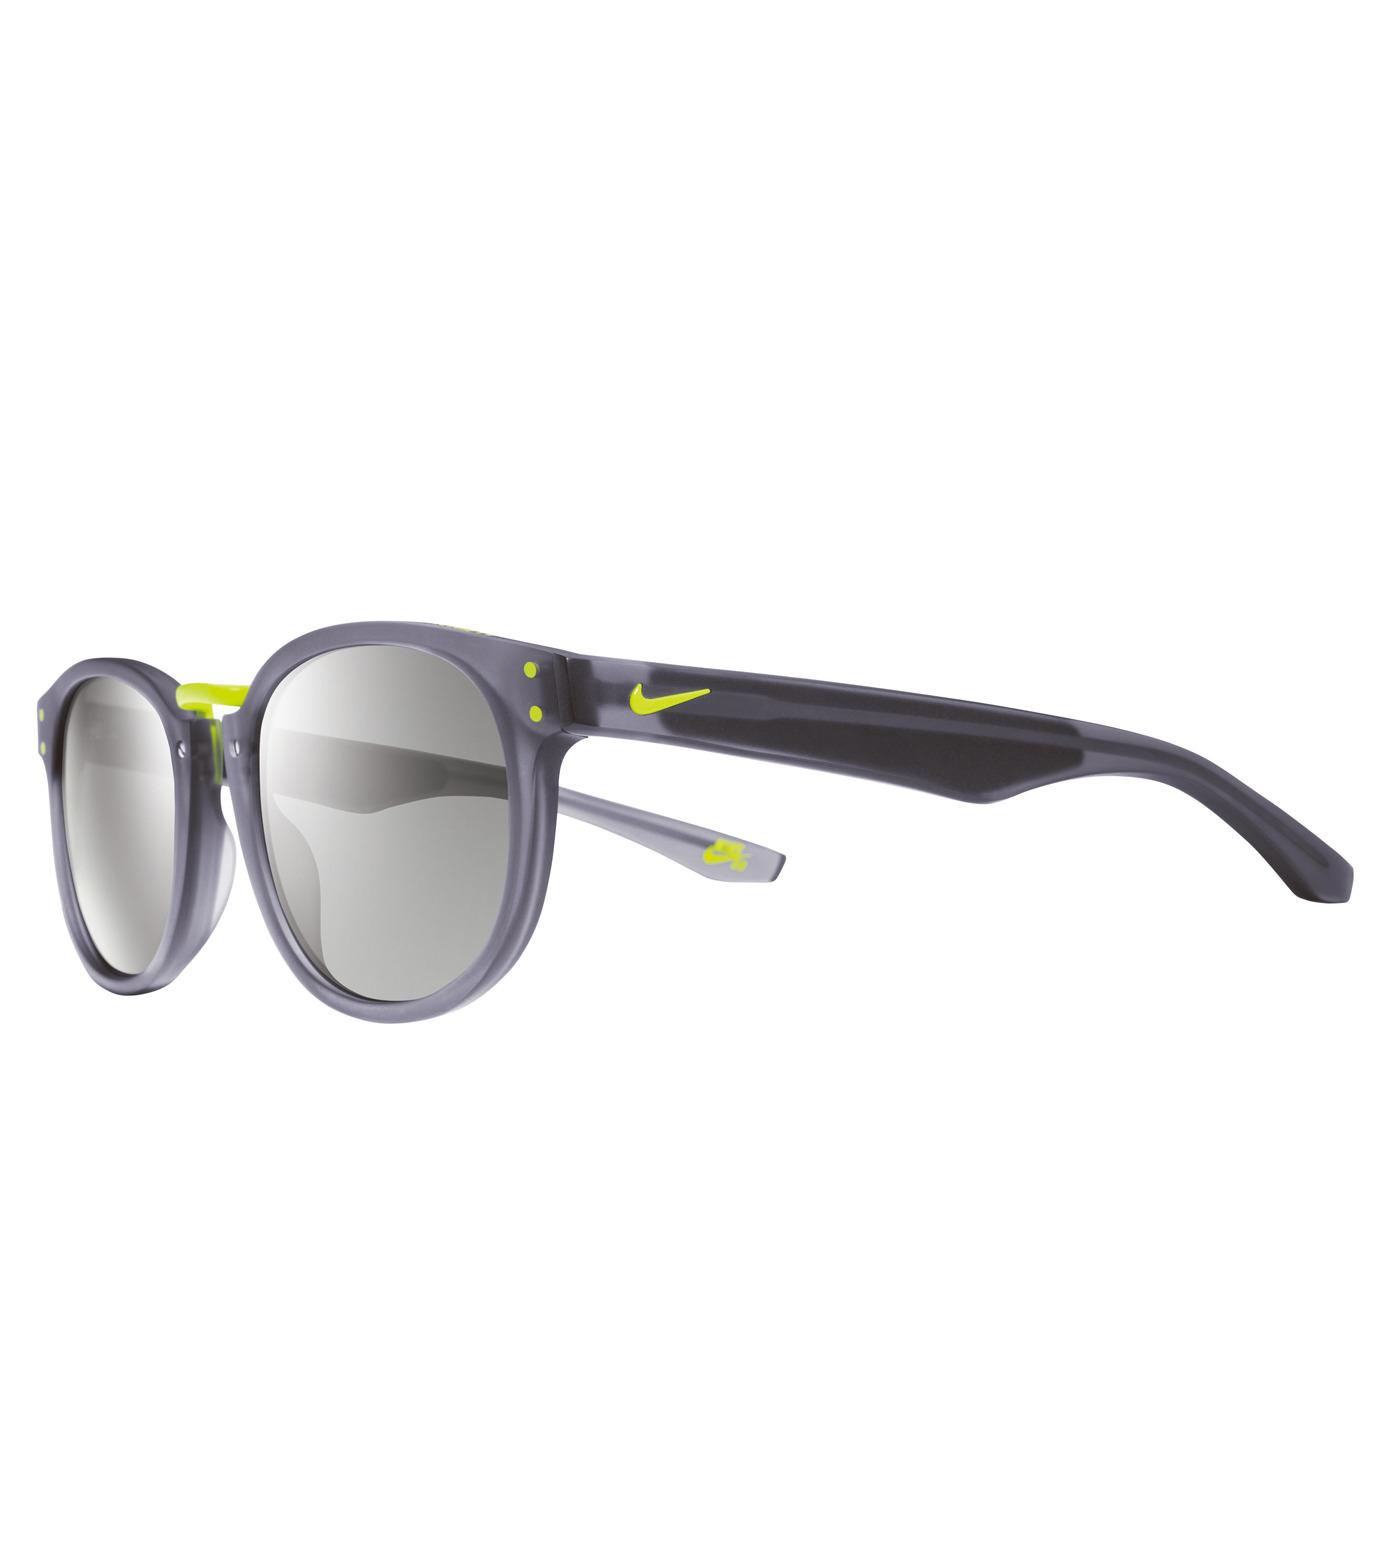 NIKE SB(ナイキ エスビー)のACHIEVE-GRAY(アイウェア/eyewear)-EV0880-003-11 拡大詳細画像1